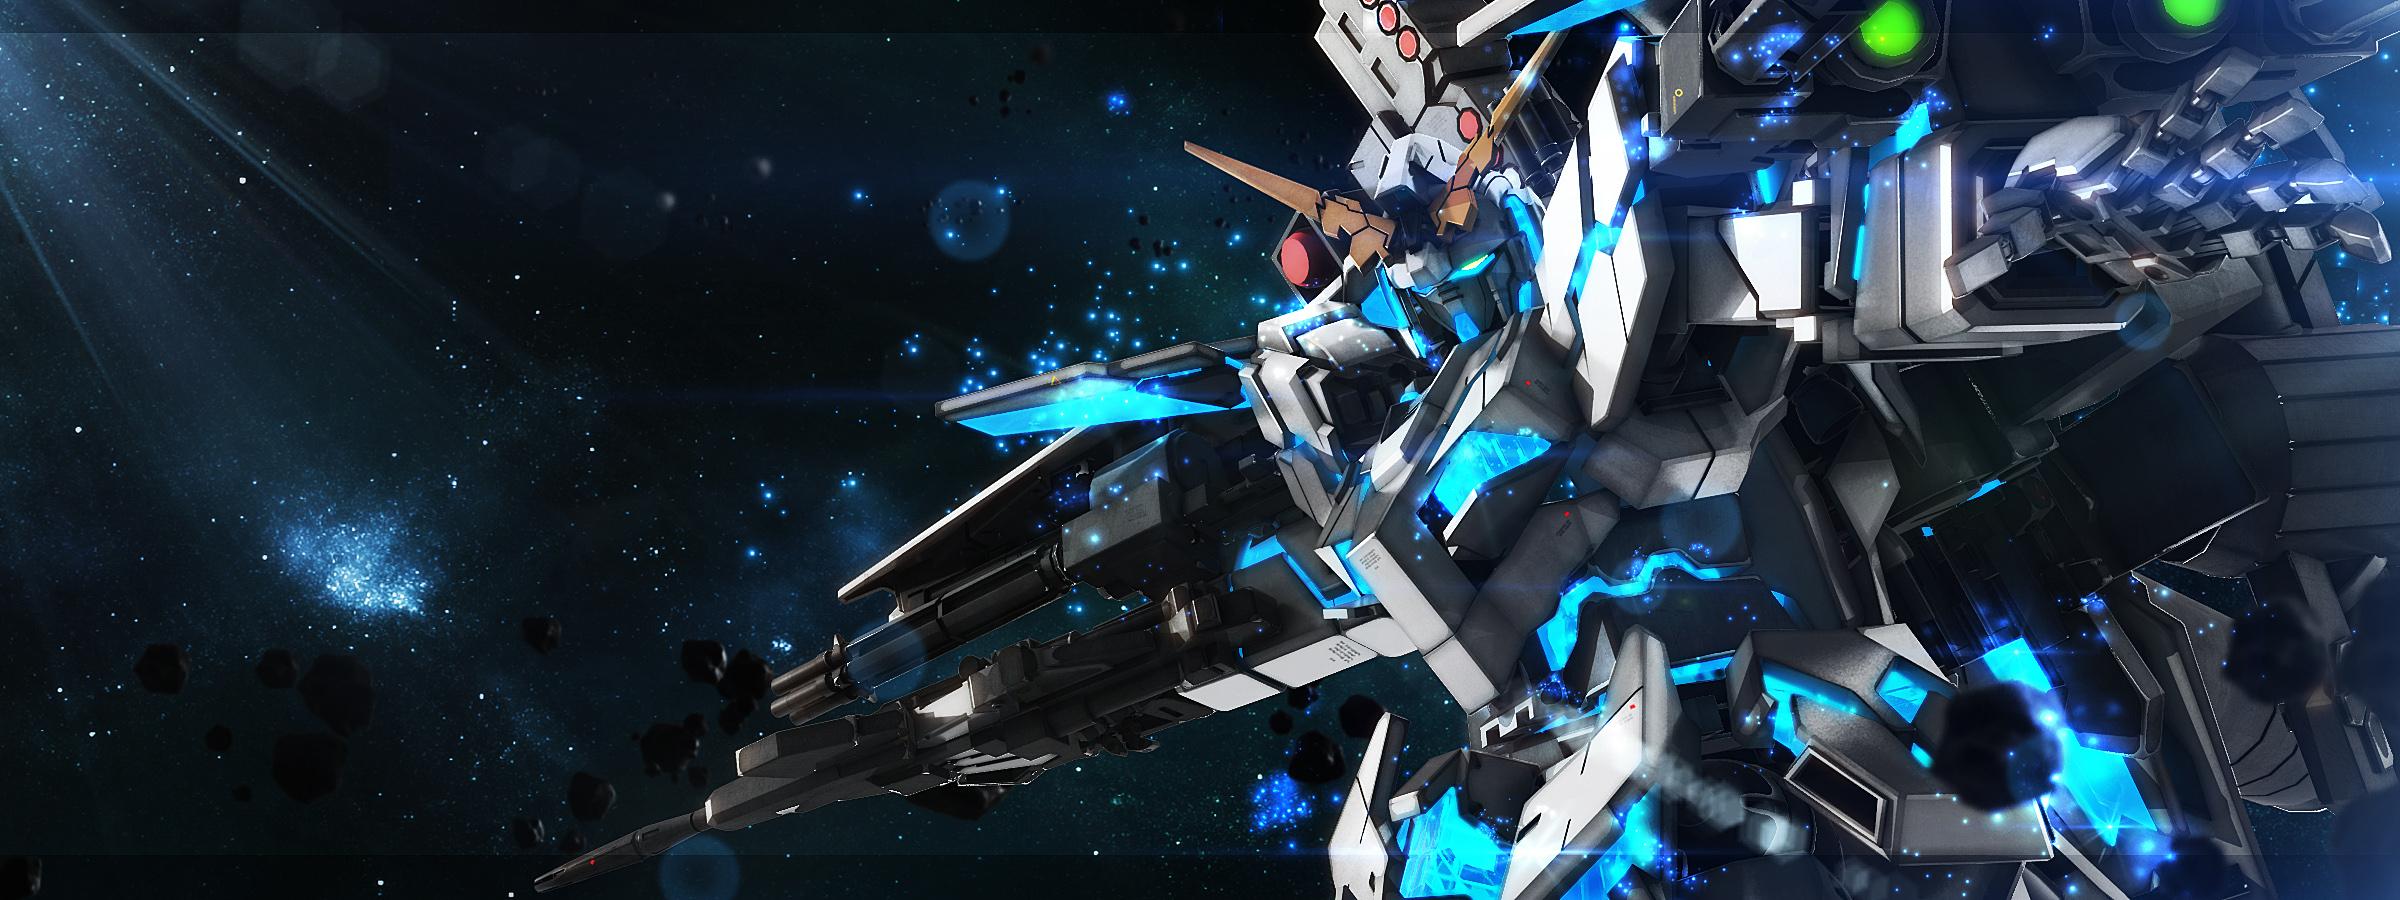 Gundam Wallpapers 2400x900